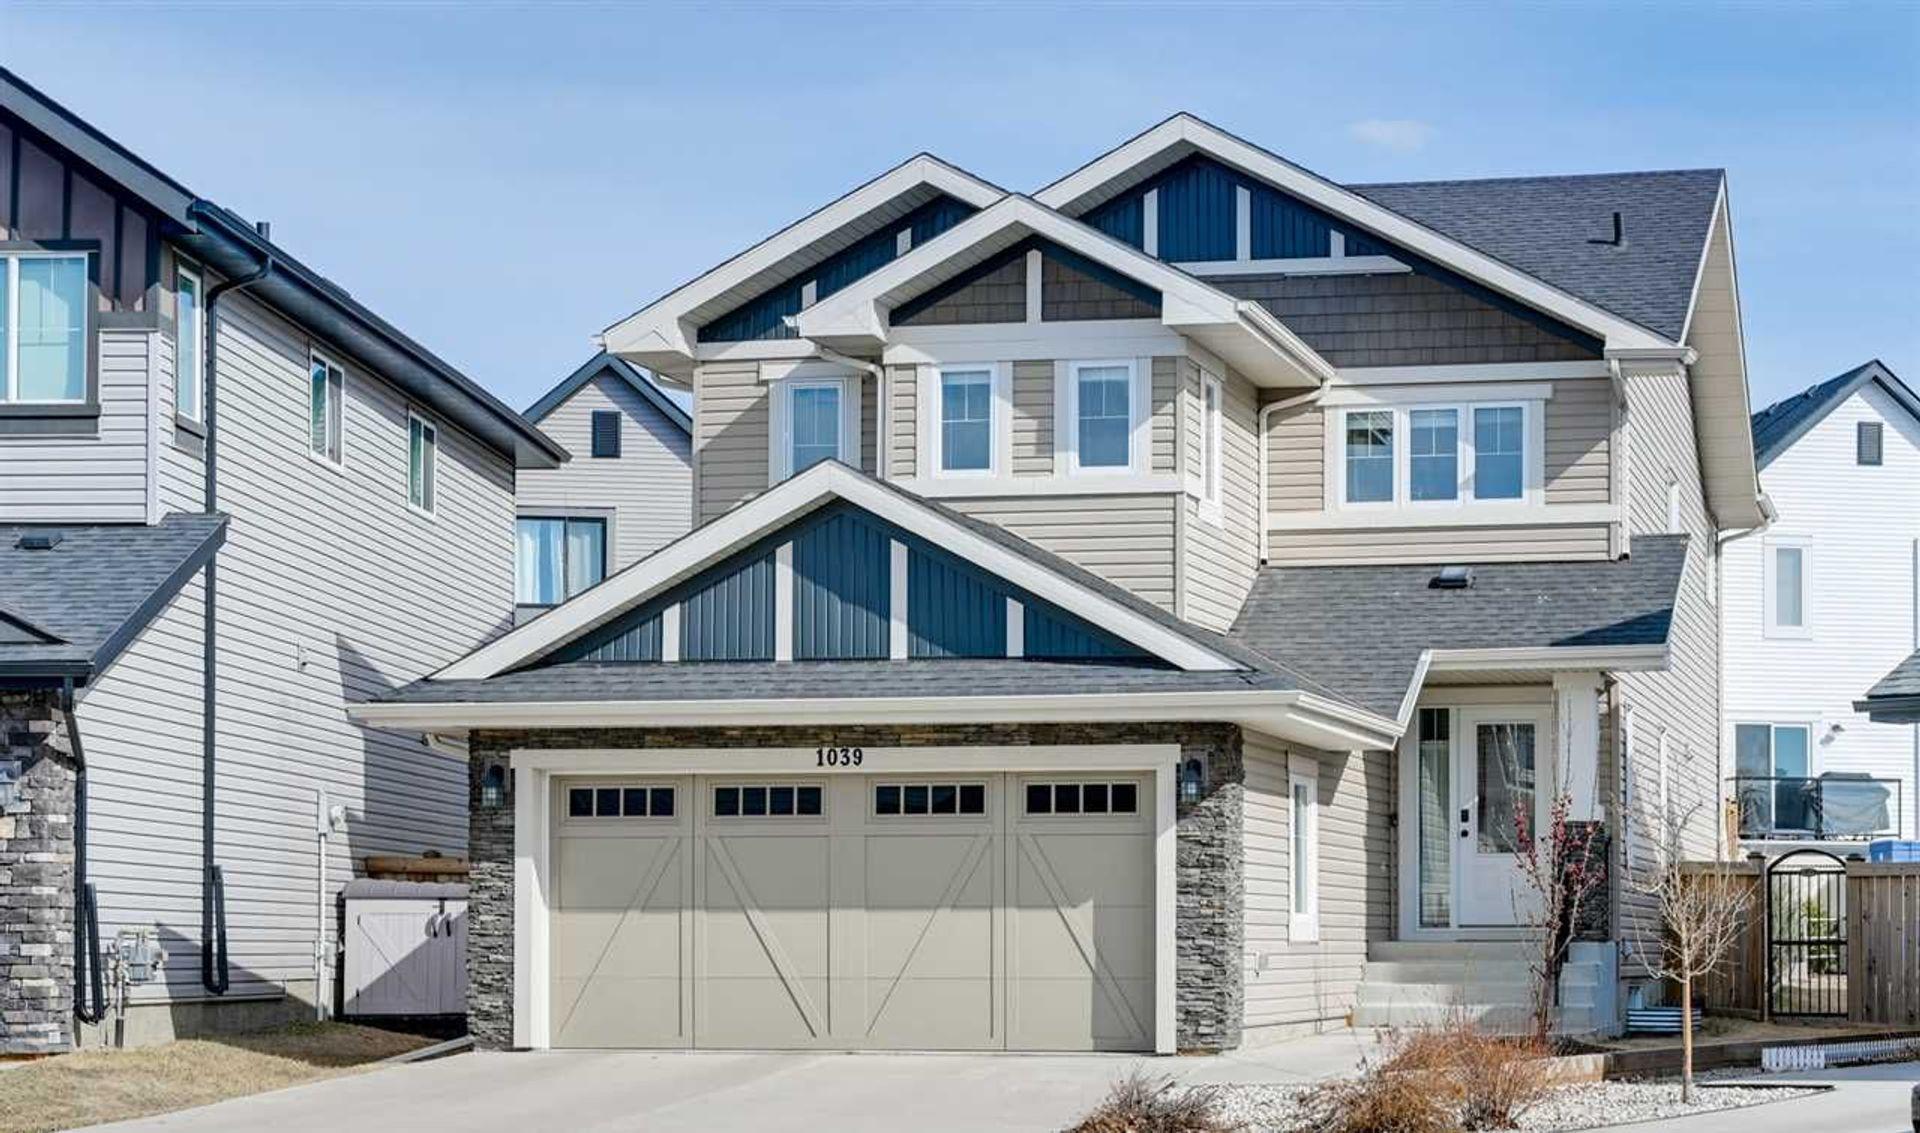 1039 158 Street Sw, Glenridding Heights, Edmonton